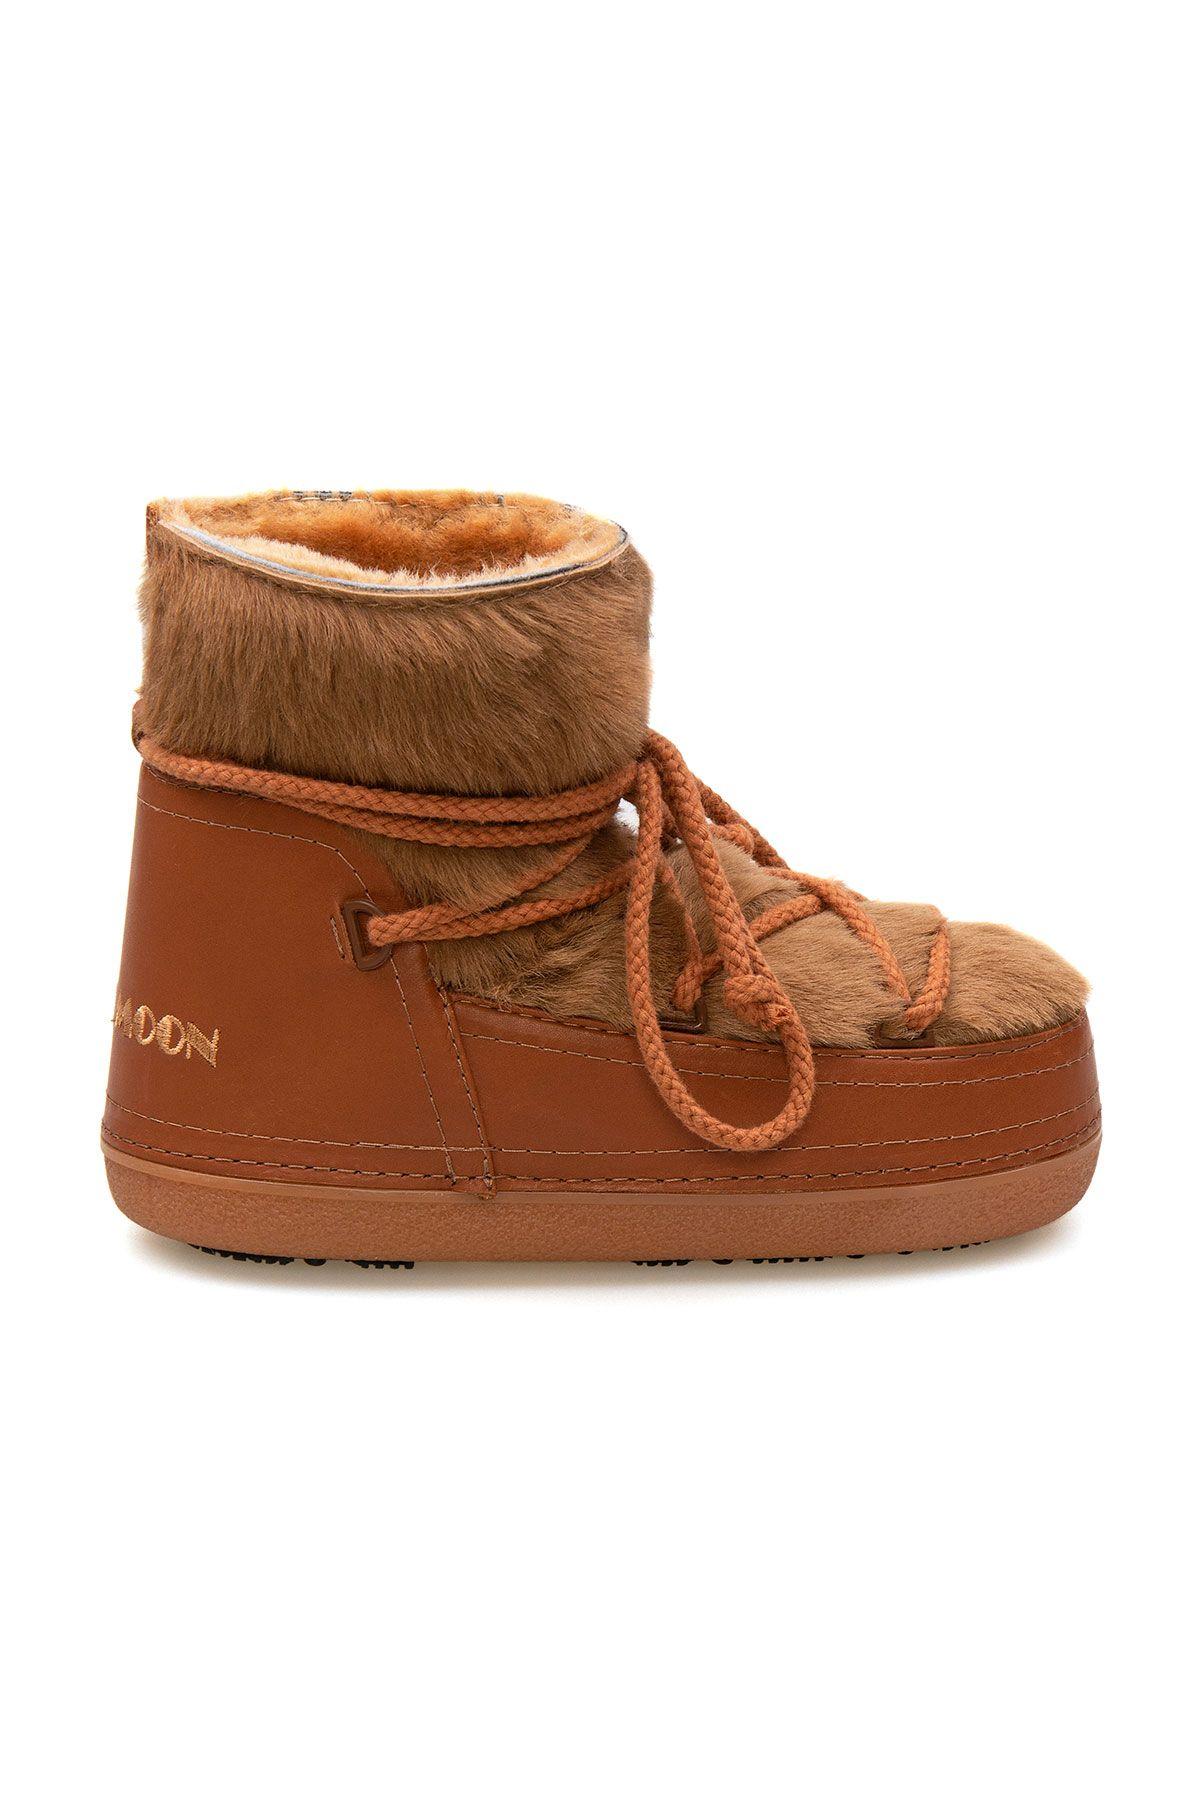 Cool Moon Genuine Sheepskin Women's Snow Boots 251329 Ginger